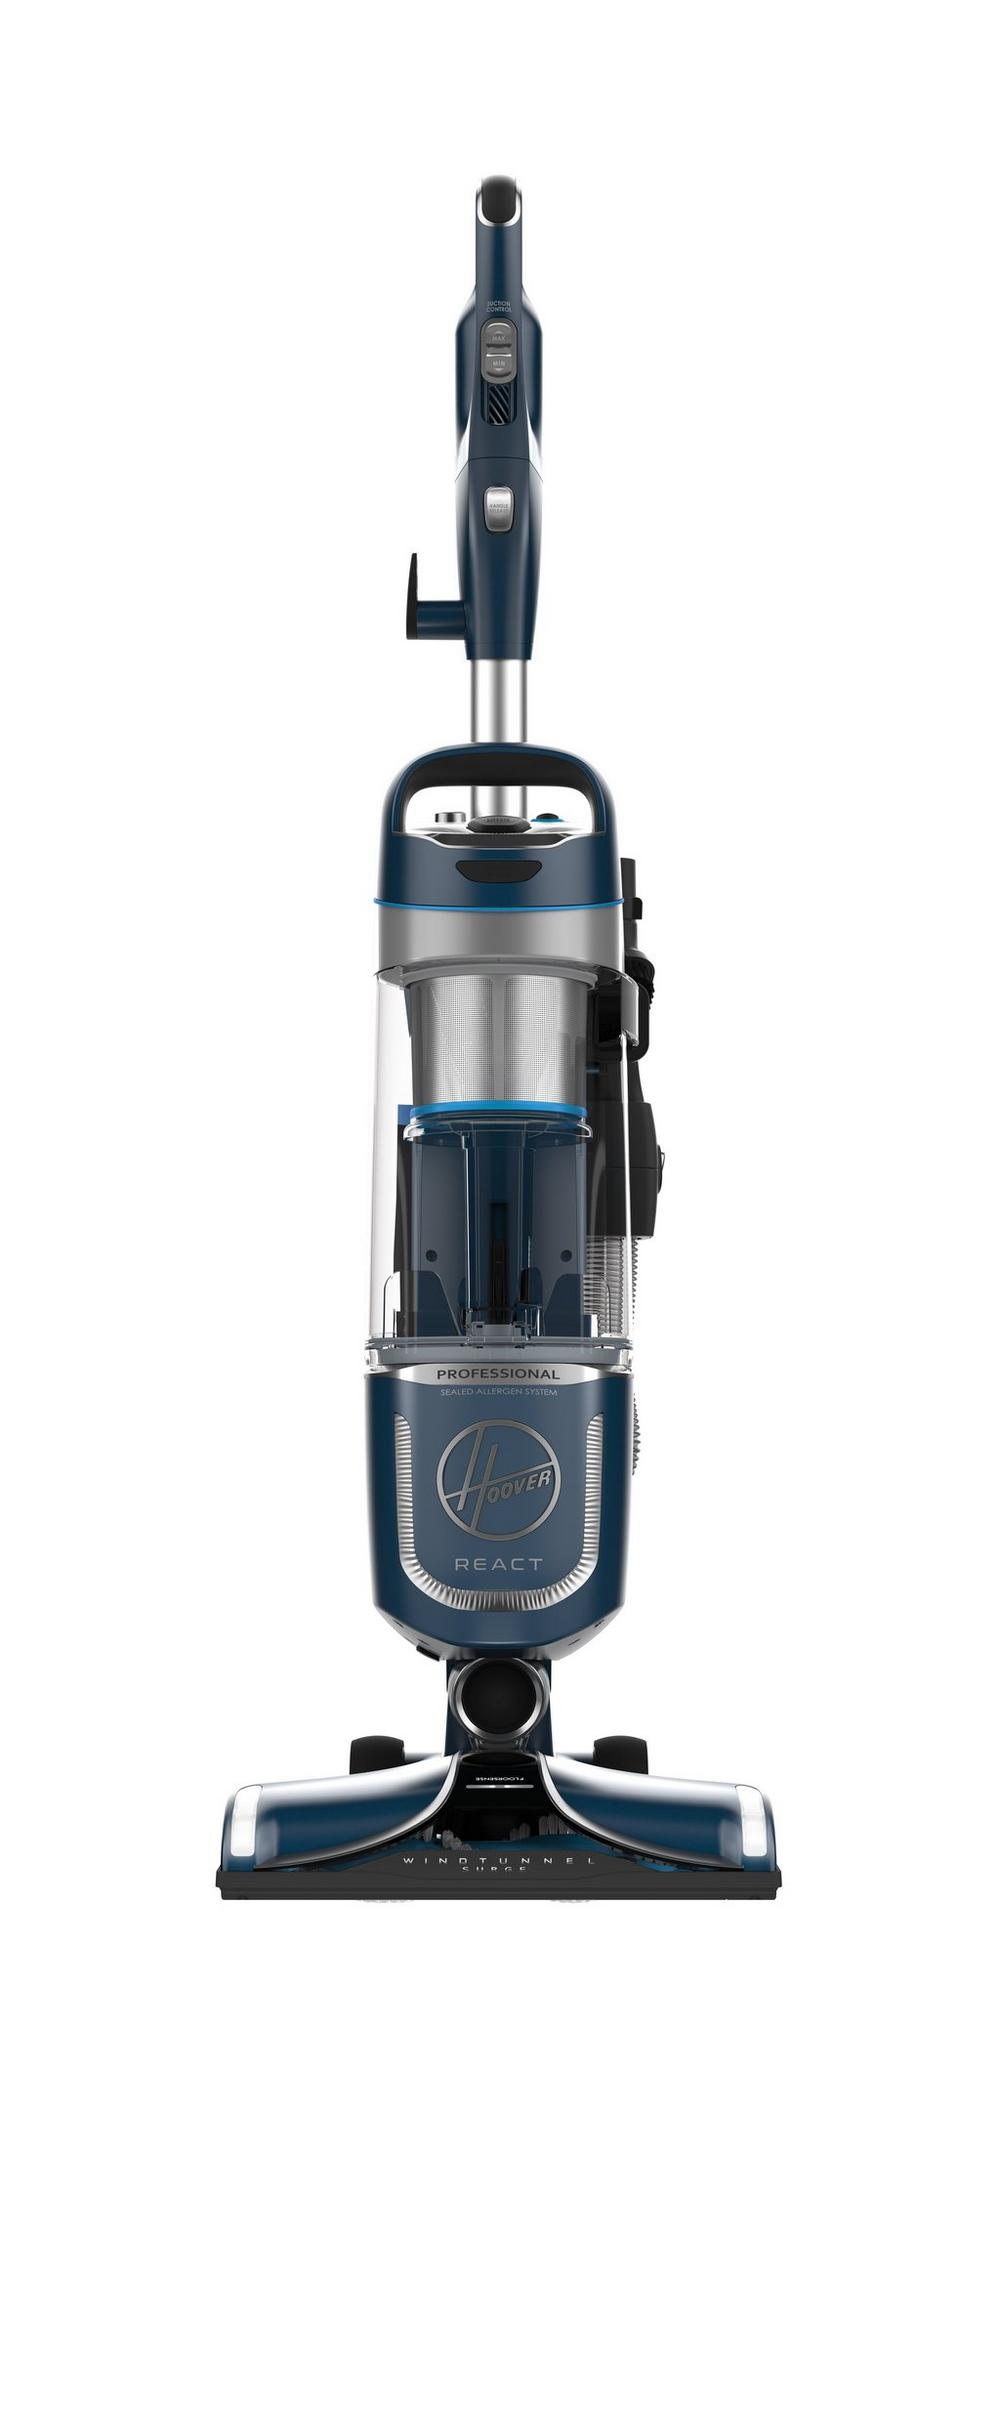 REACT Professional Access Upright Vacuum